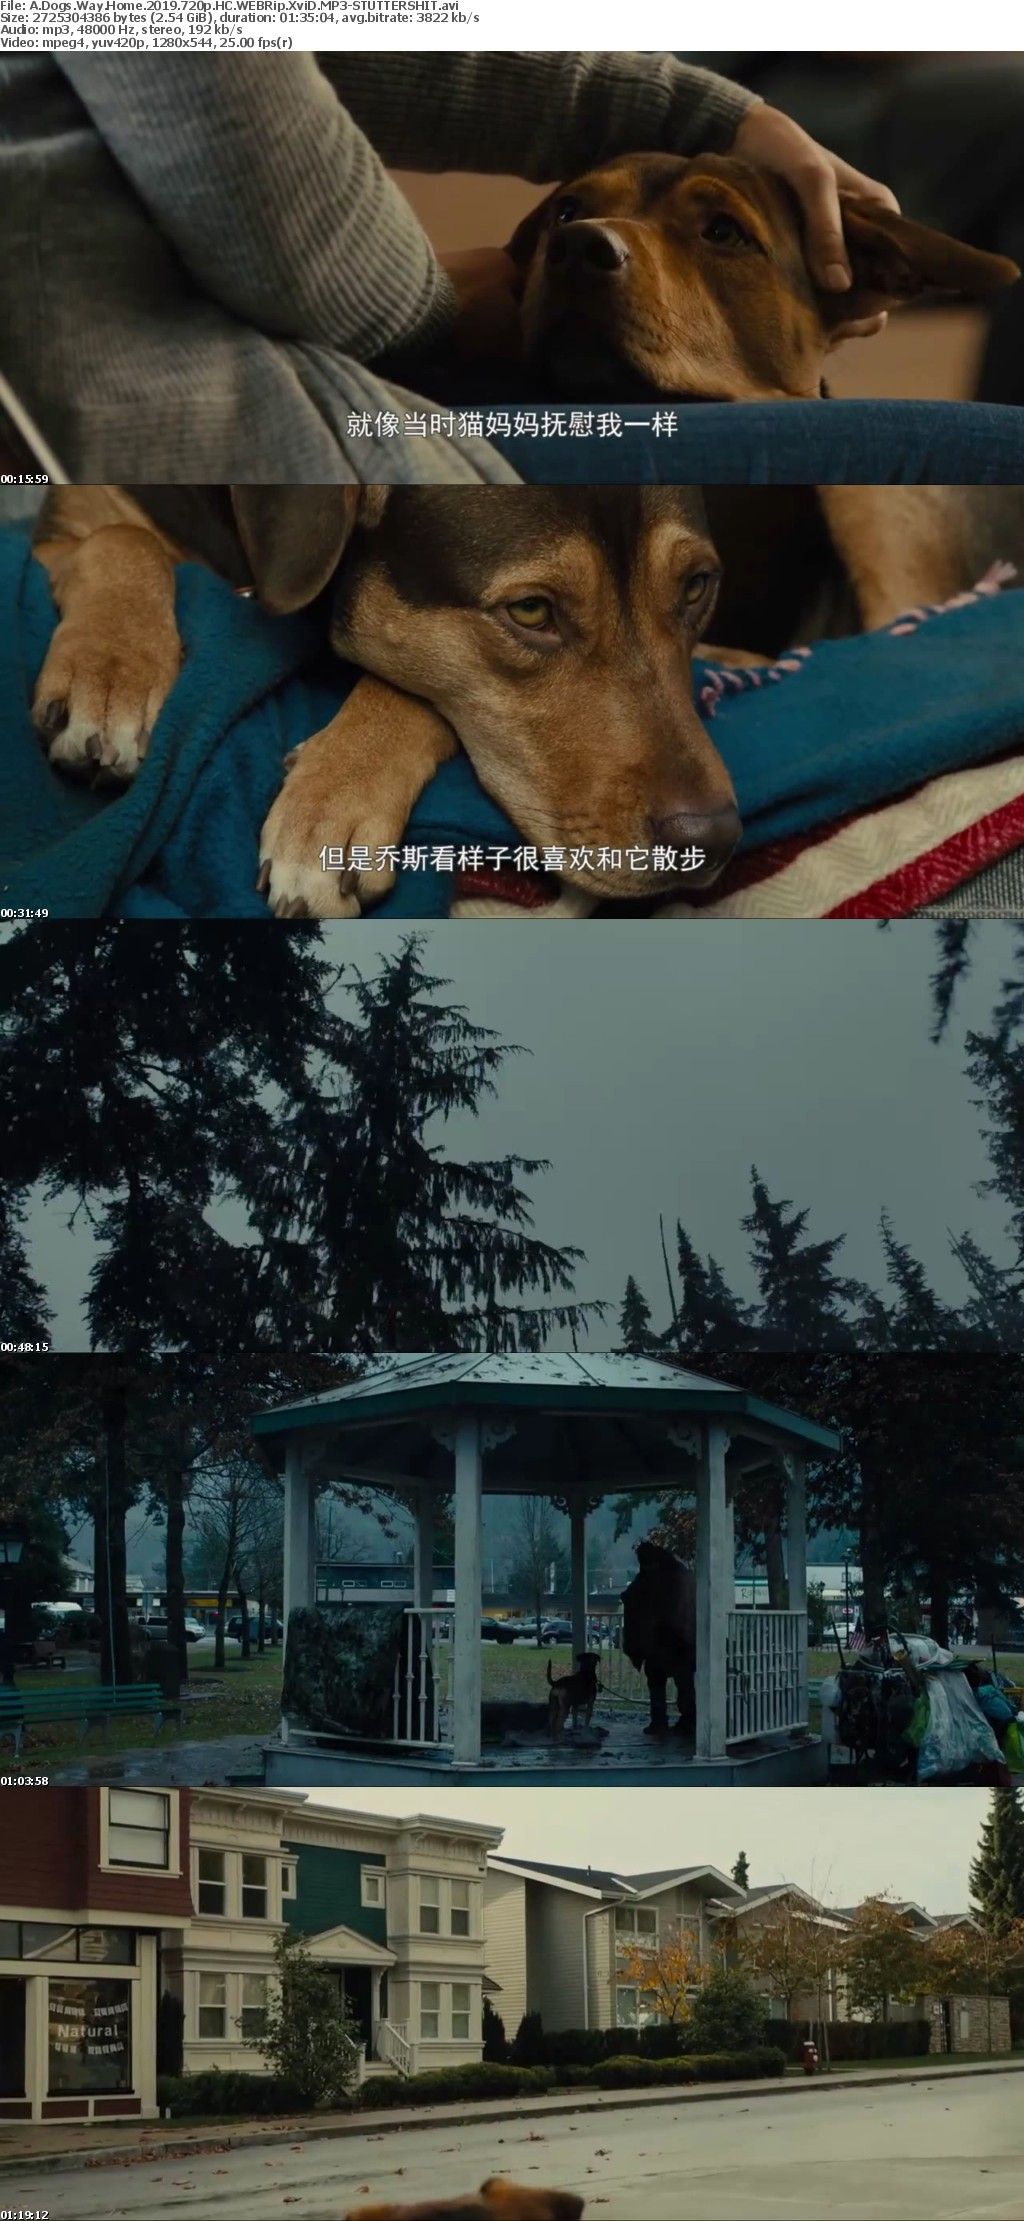 A Dogs Way Home 2019 720p HC WEBRip XviD MP3-STUTTERSHIT